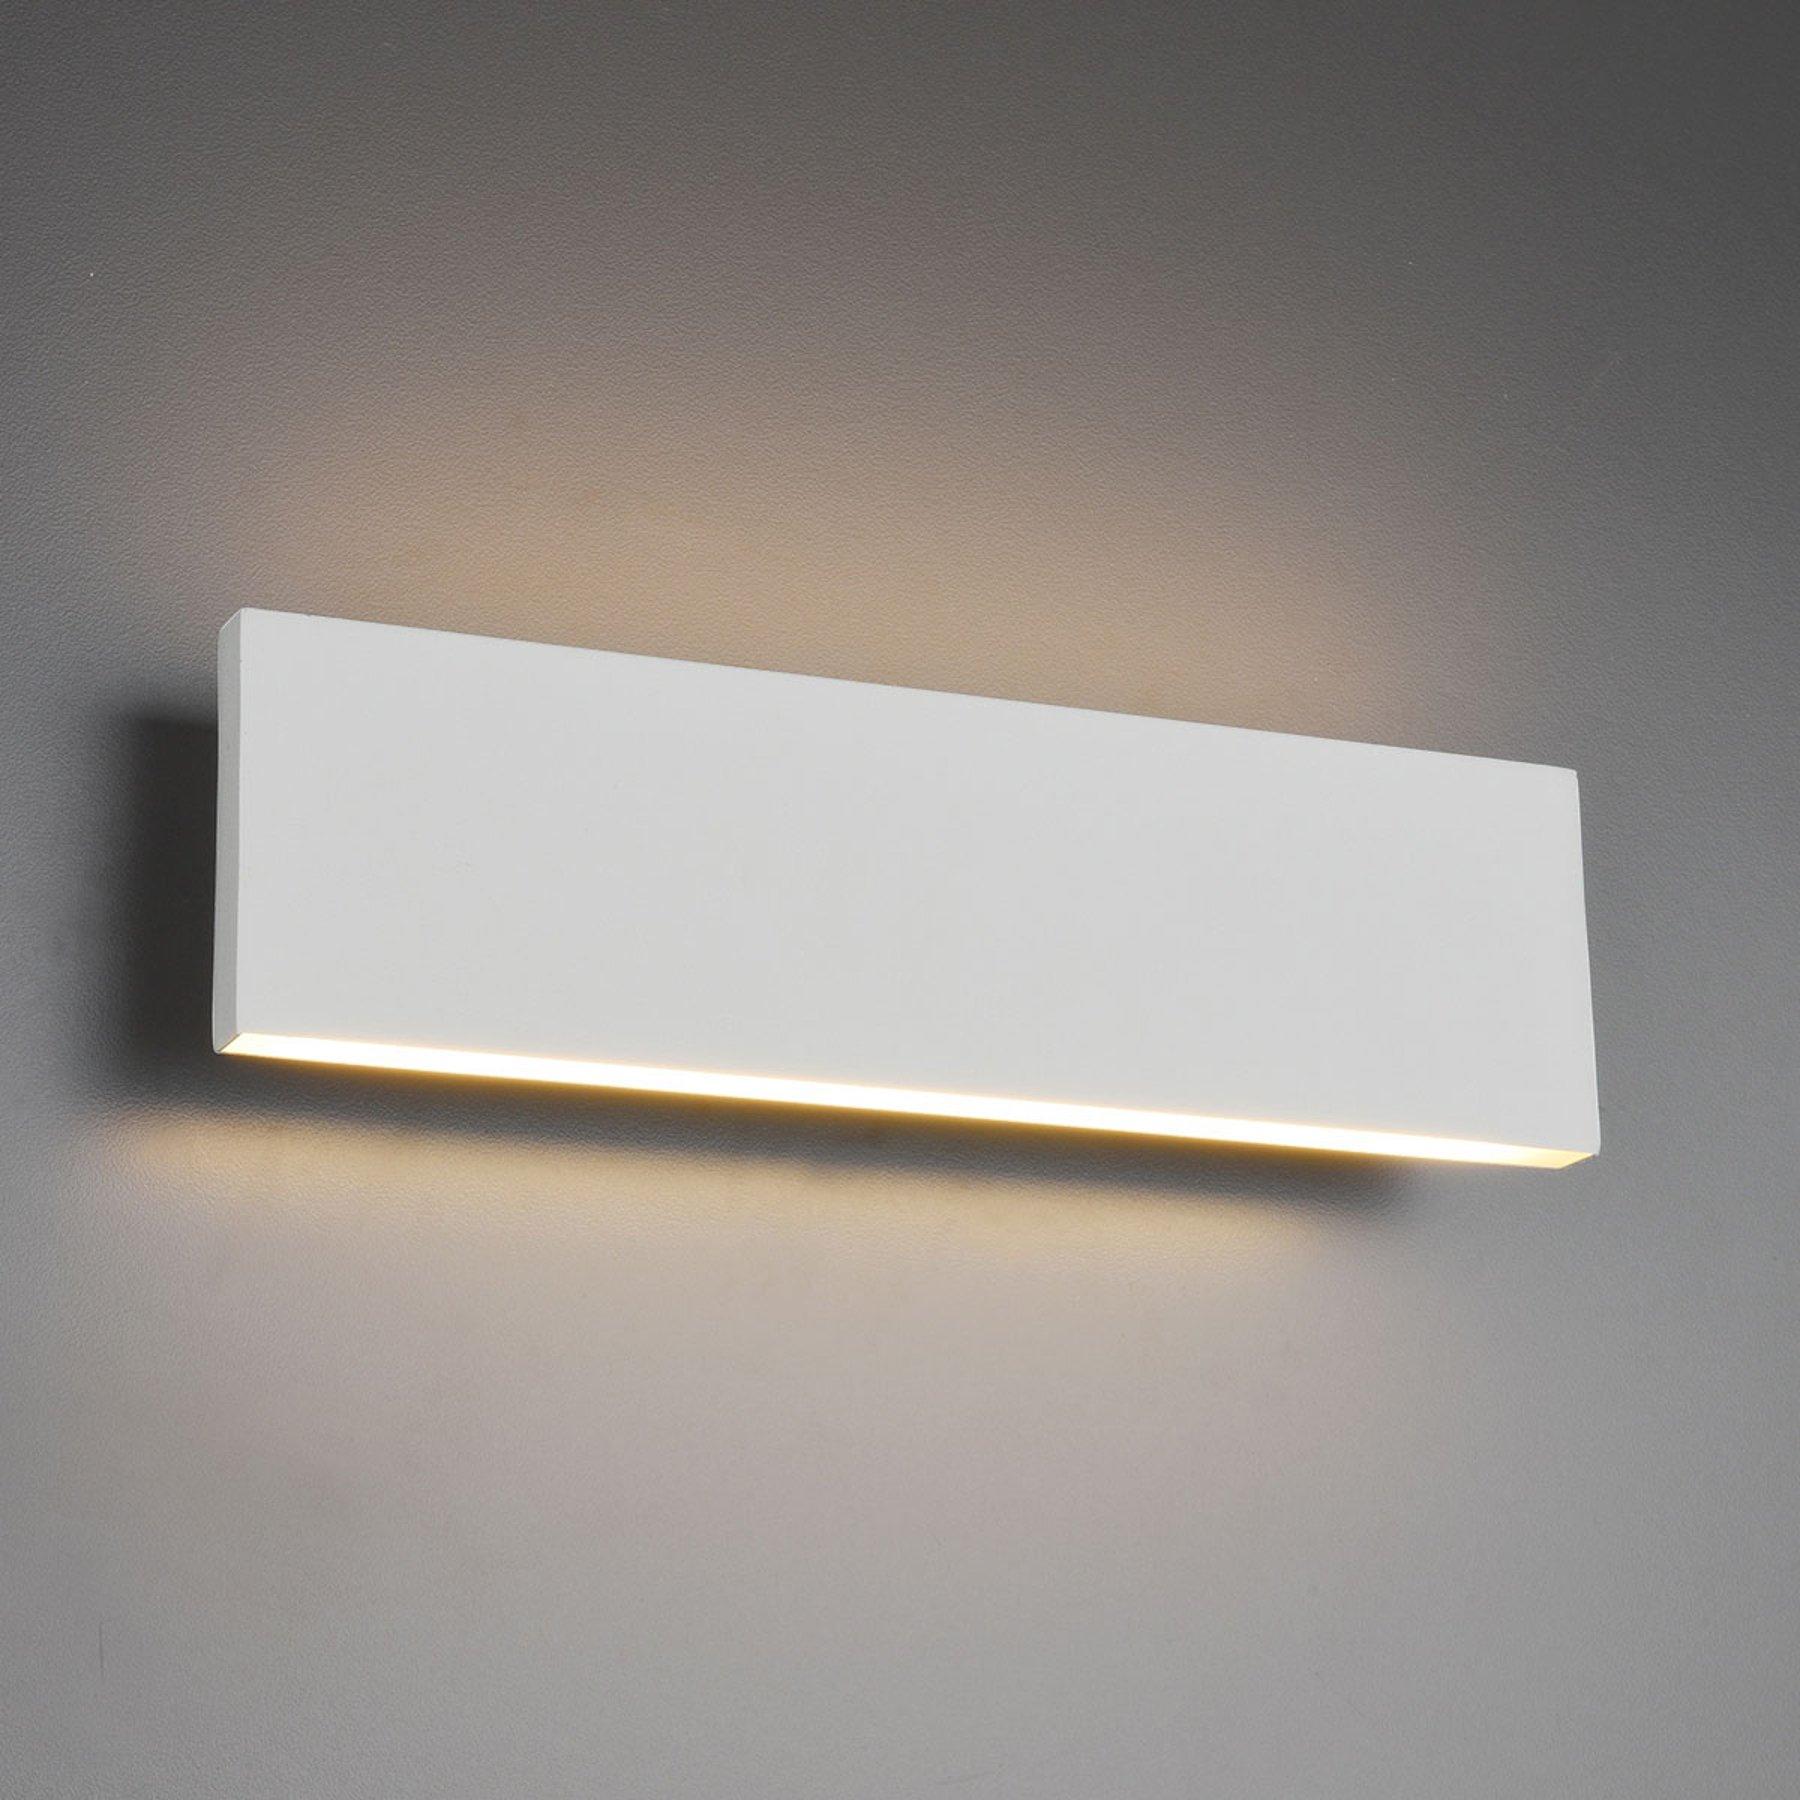 LED-vegglampe Concha 28 cm, hvit